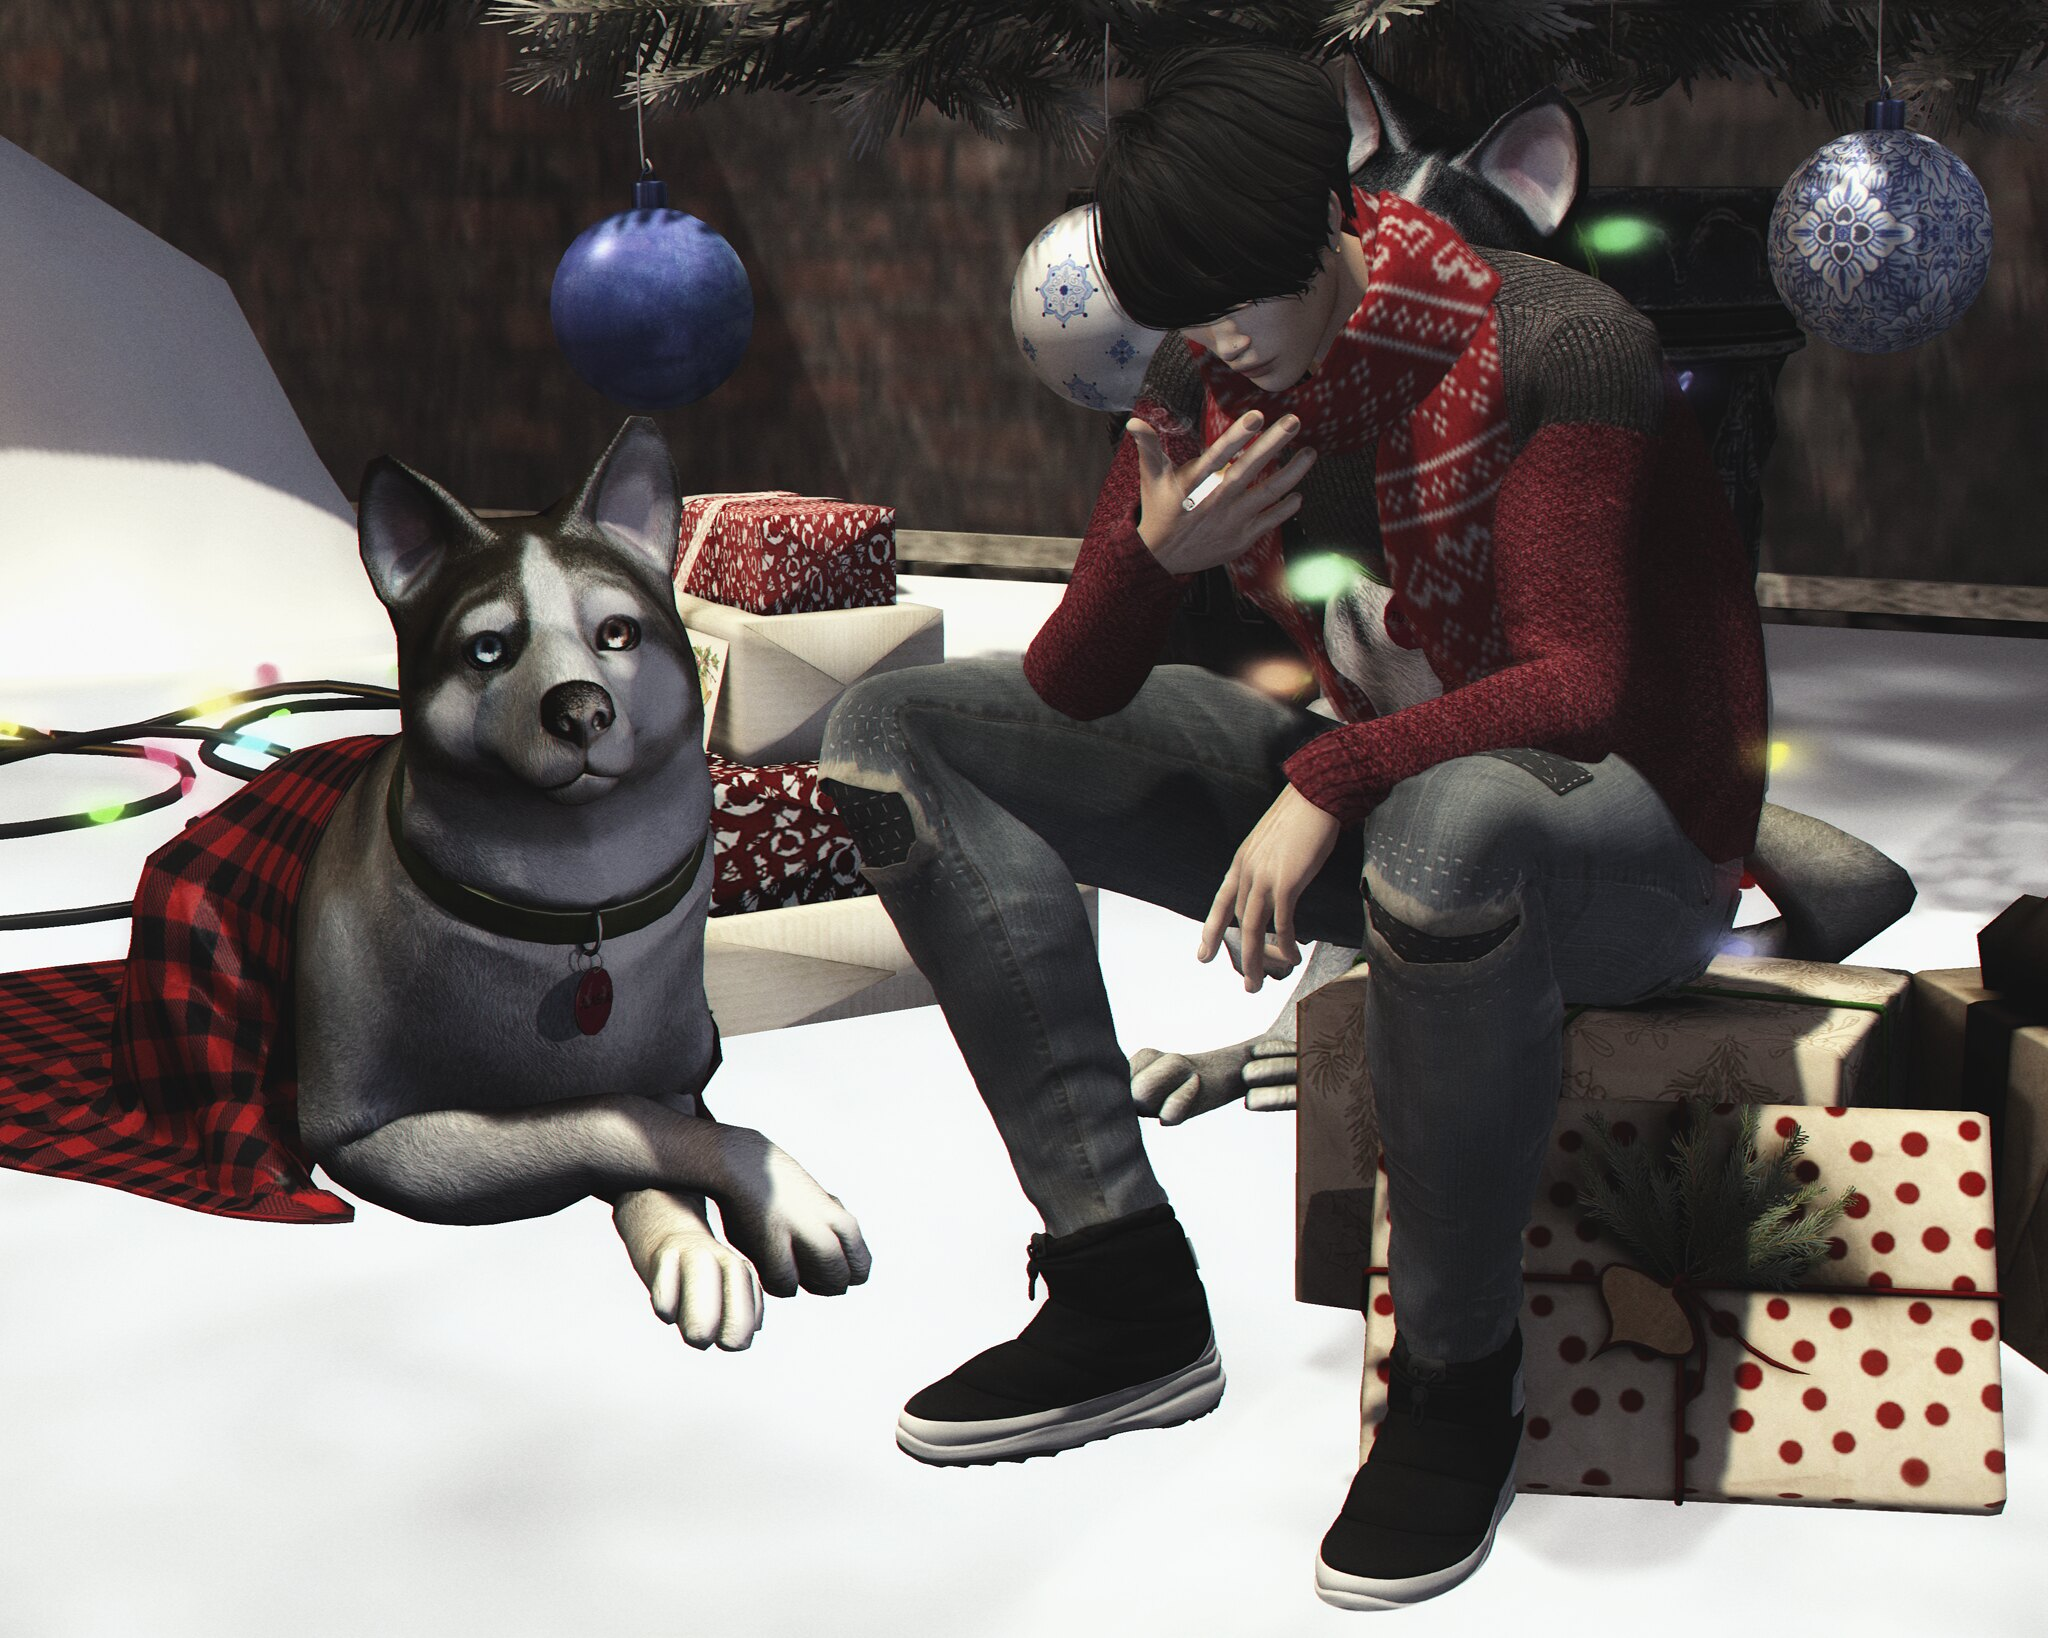 Merry Xmas, Guys!! Love you all ♥